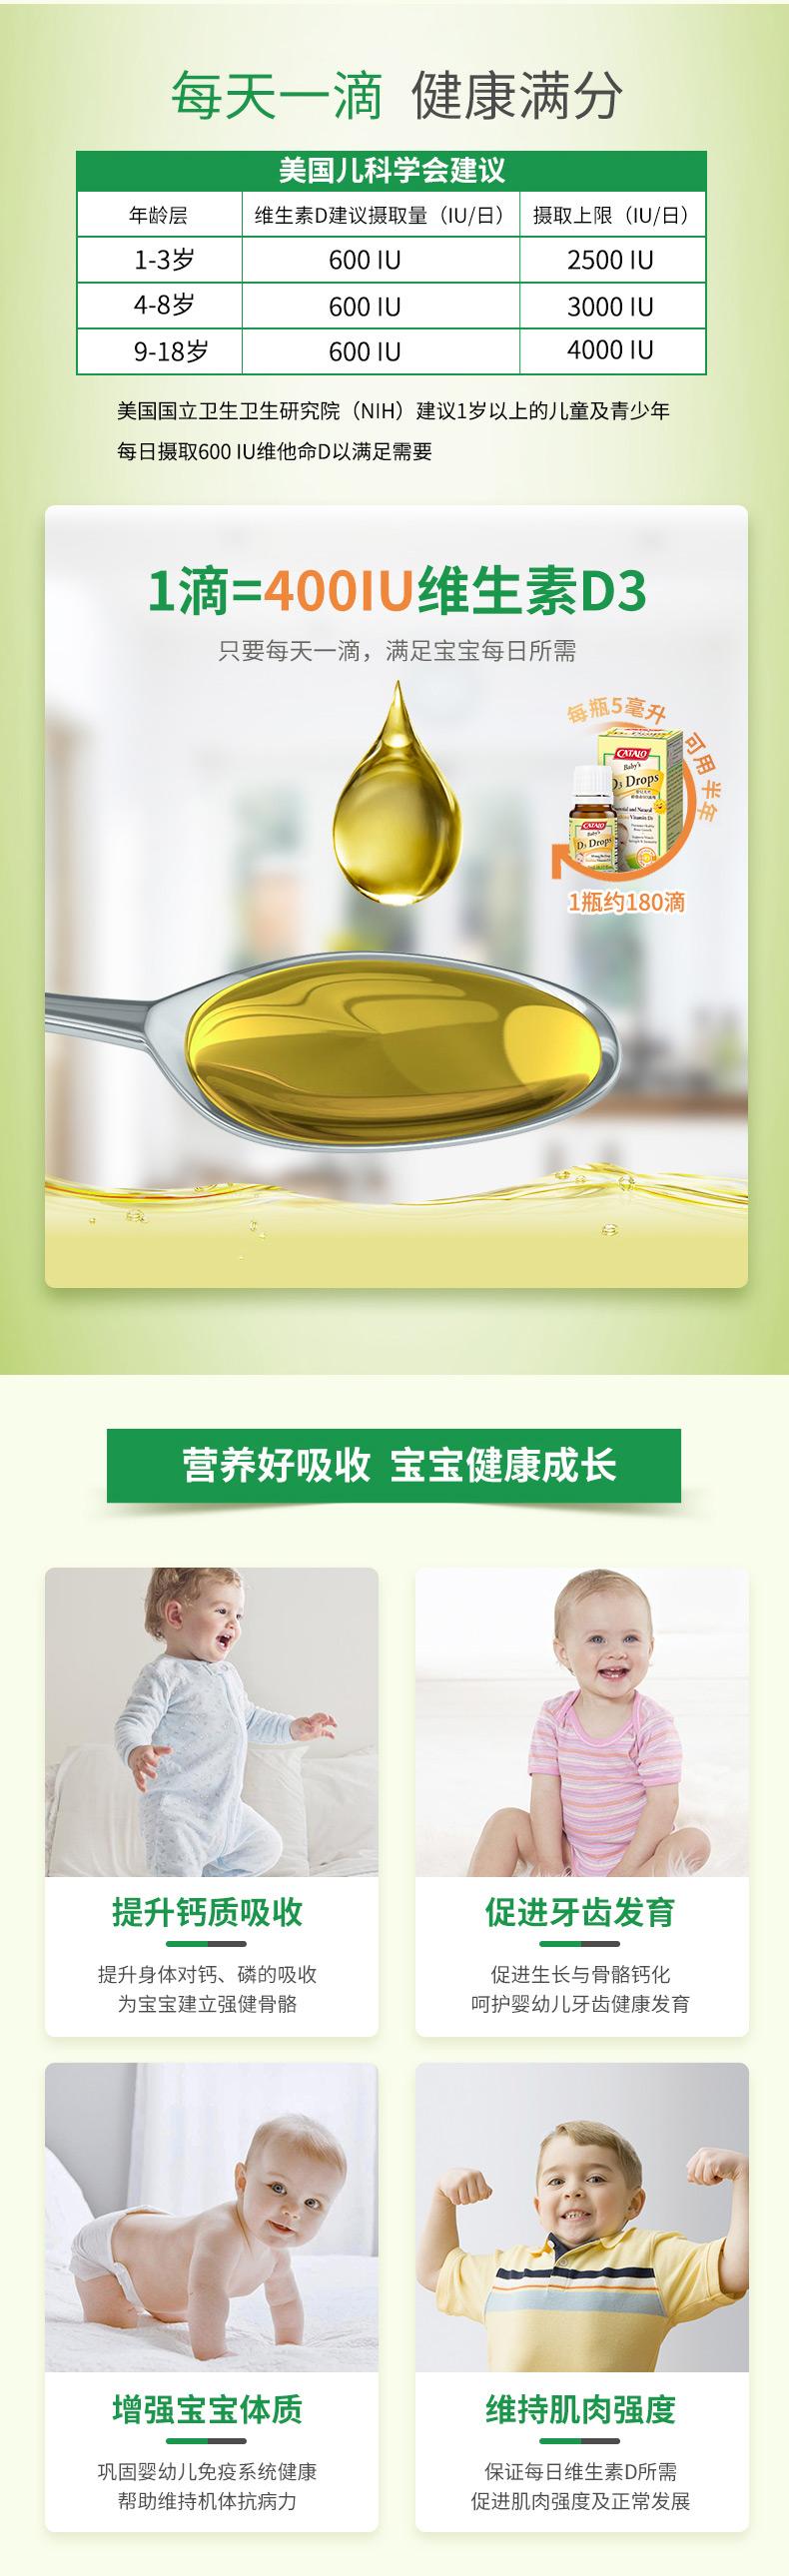 CATALO家得路美国进口婴幼儿维生素d儿童宝宝d3滴剂*2 产品系列 第2张